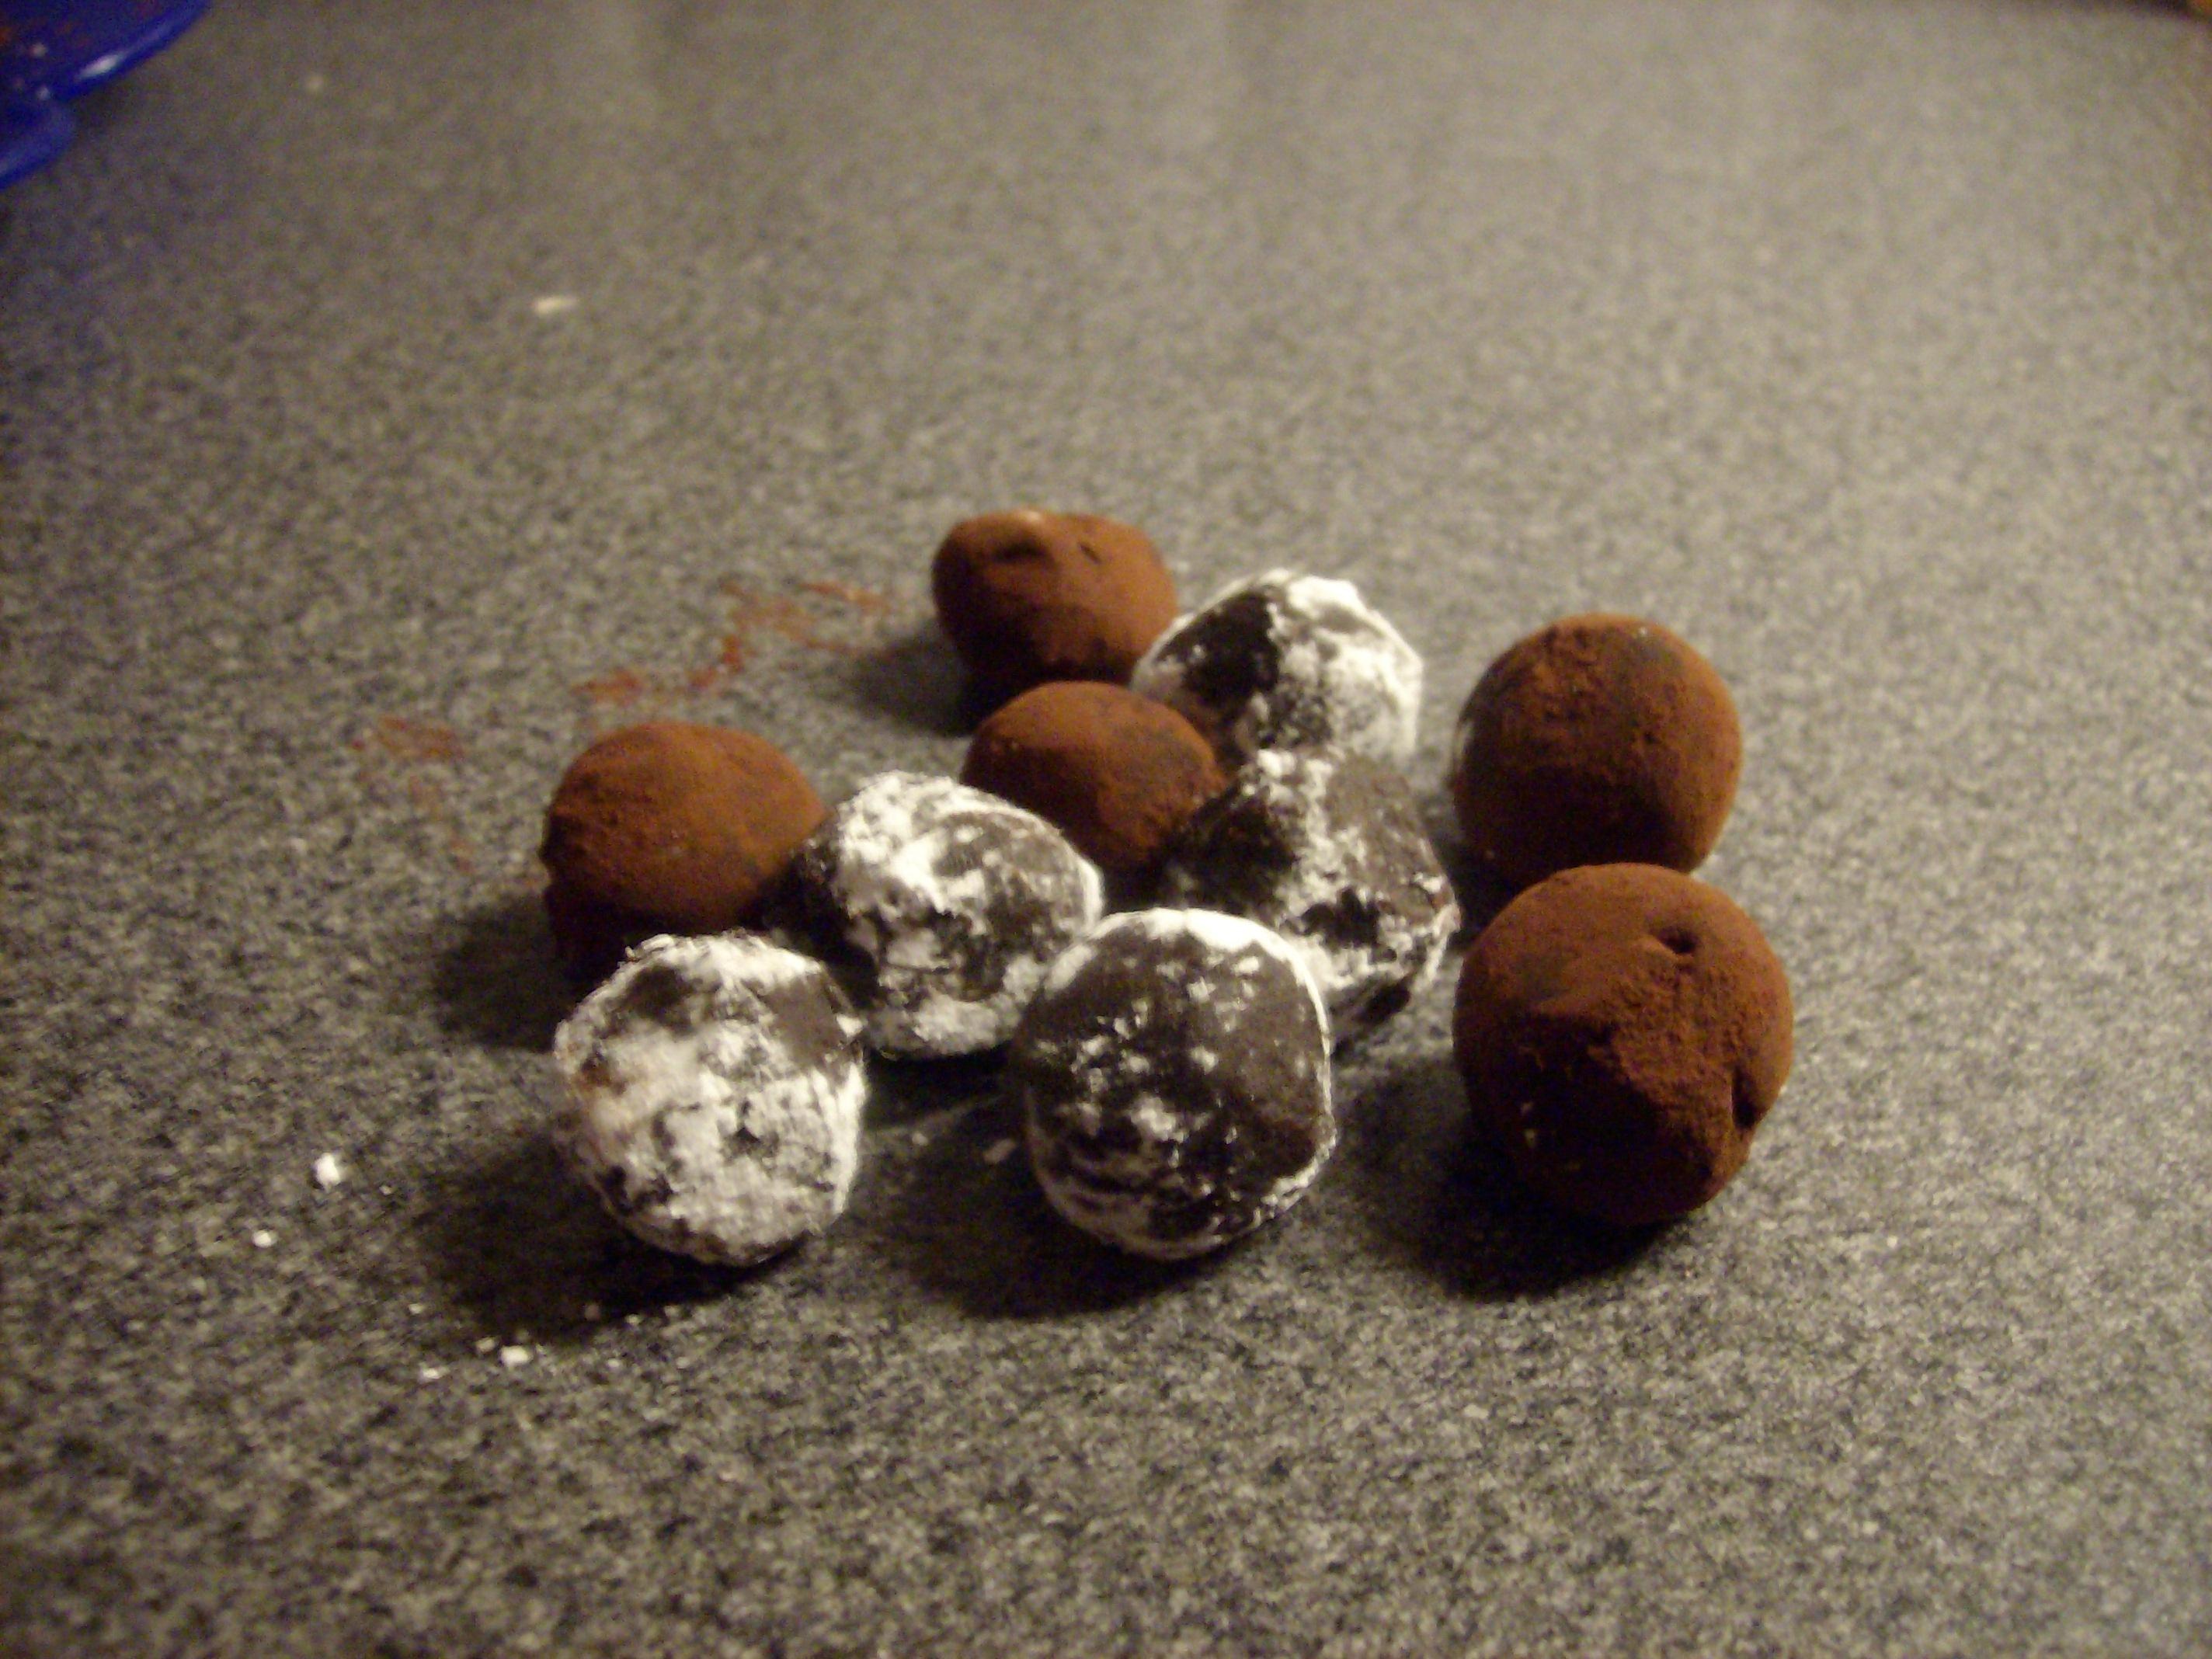 ljuvliga chokladpraliner